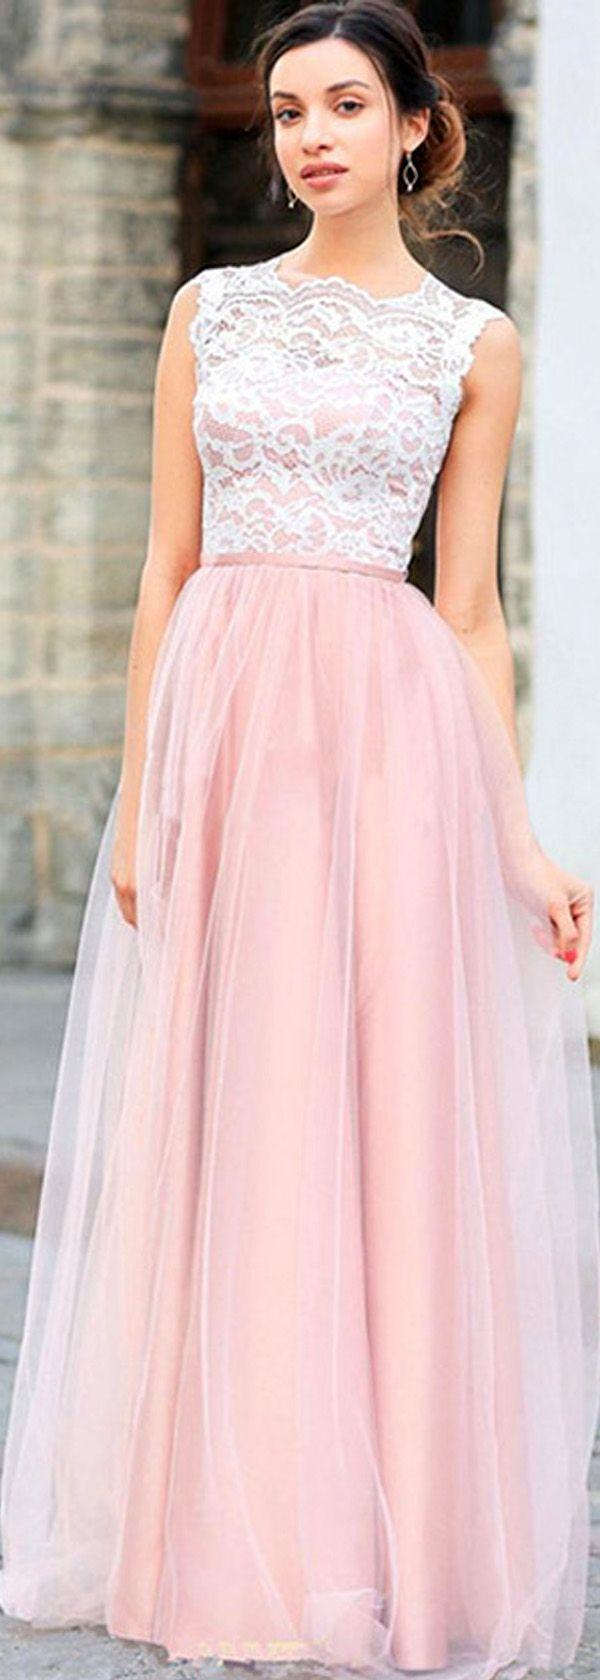 Encantador Vestidos Modestos Para Prom Cresta - Colección de ...